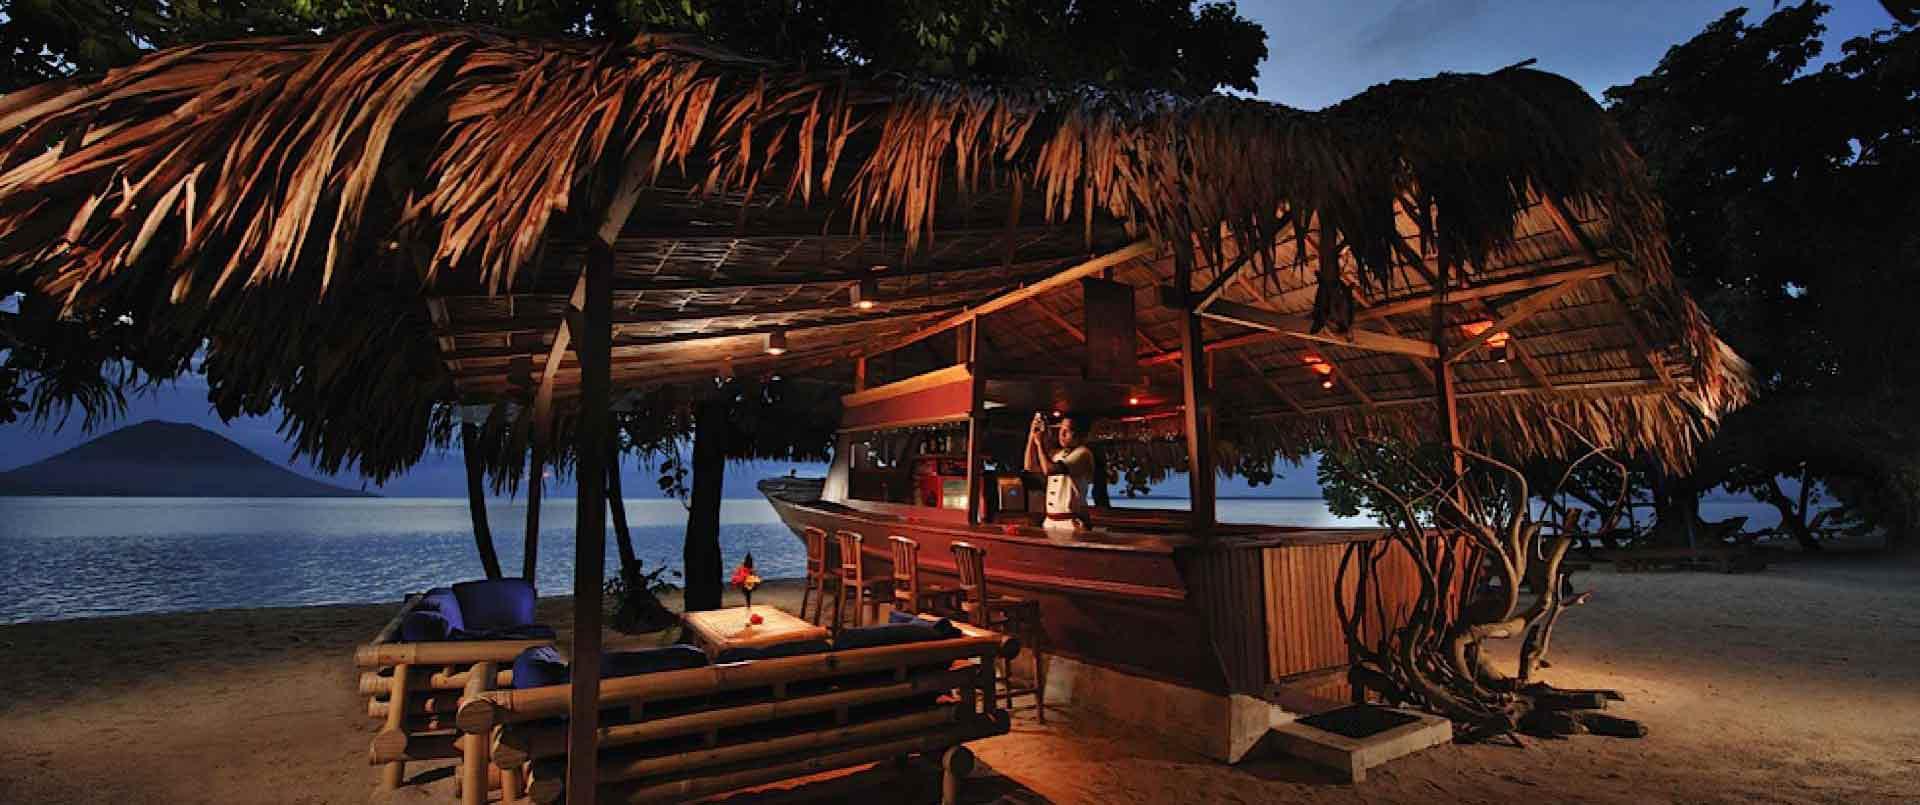 Siladen Resort, North Sulawesi